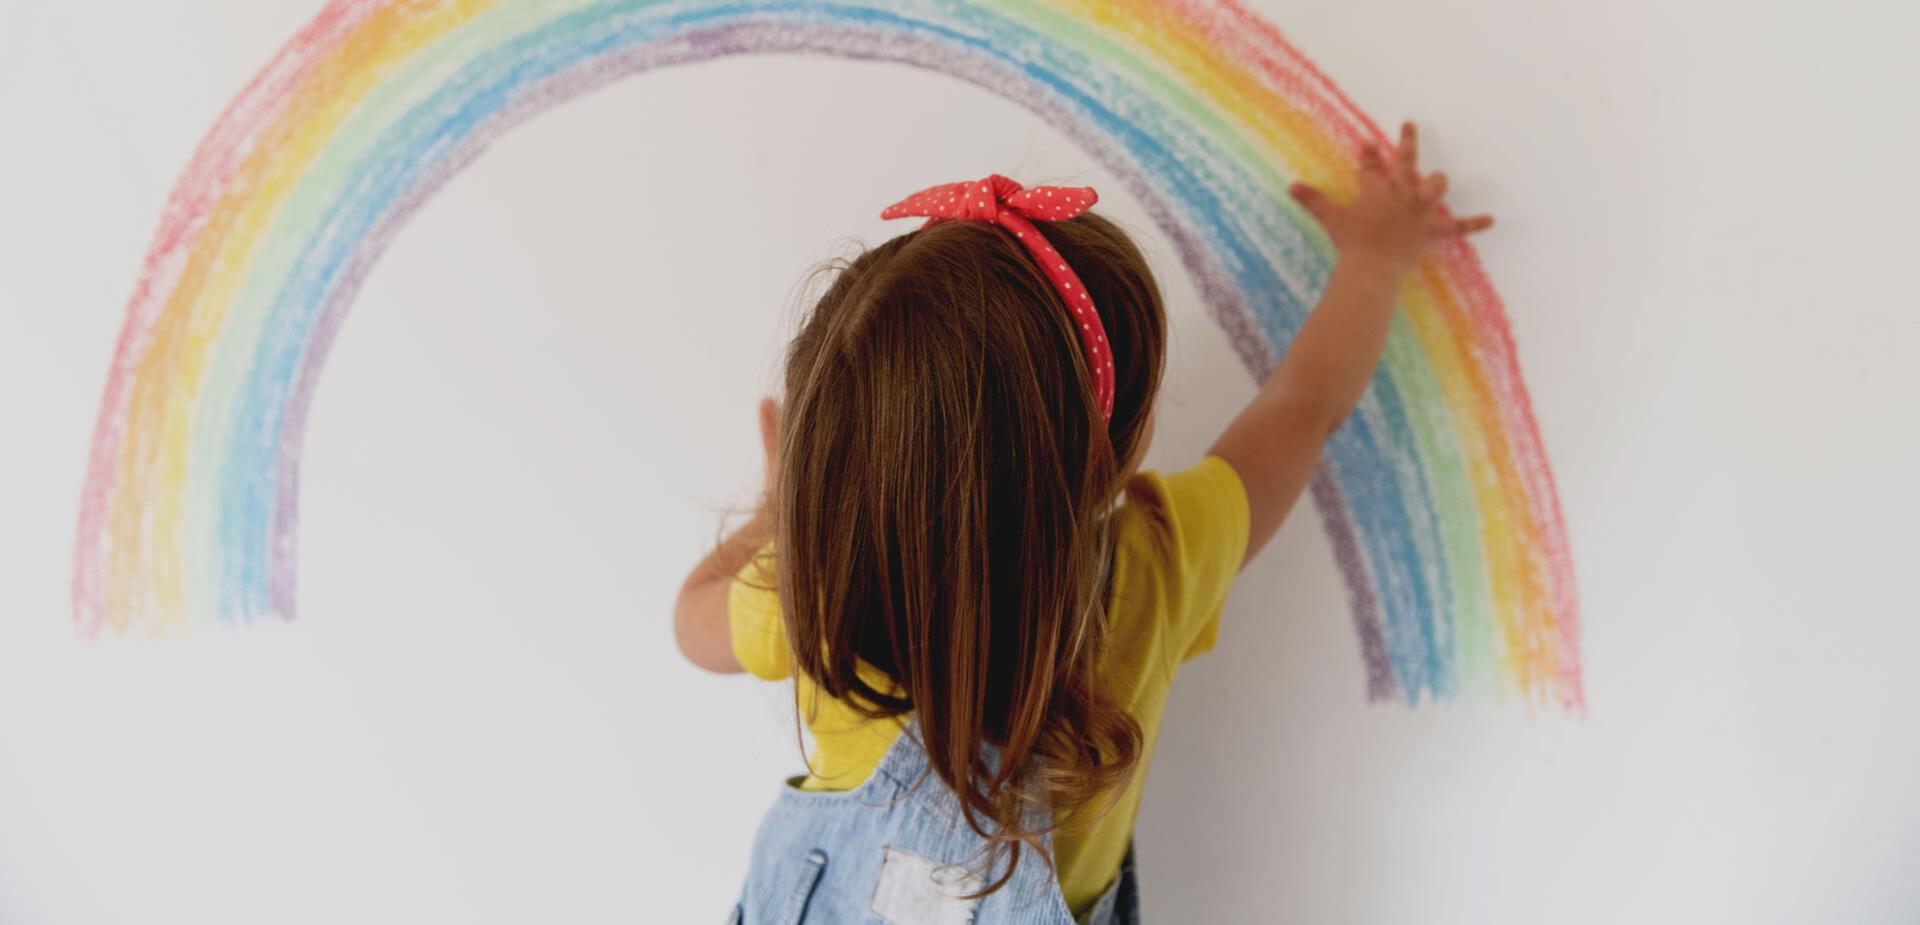 hotelervill en colouring-ideas-for-children 012